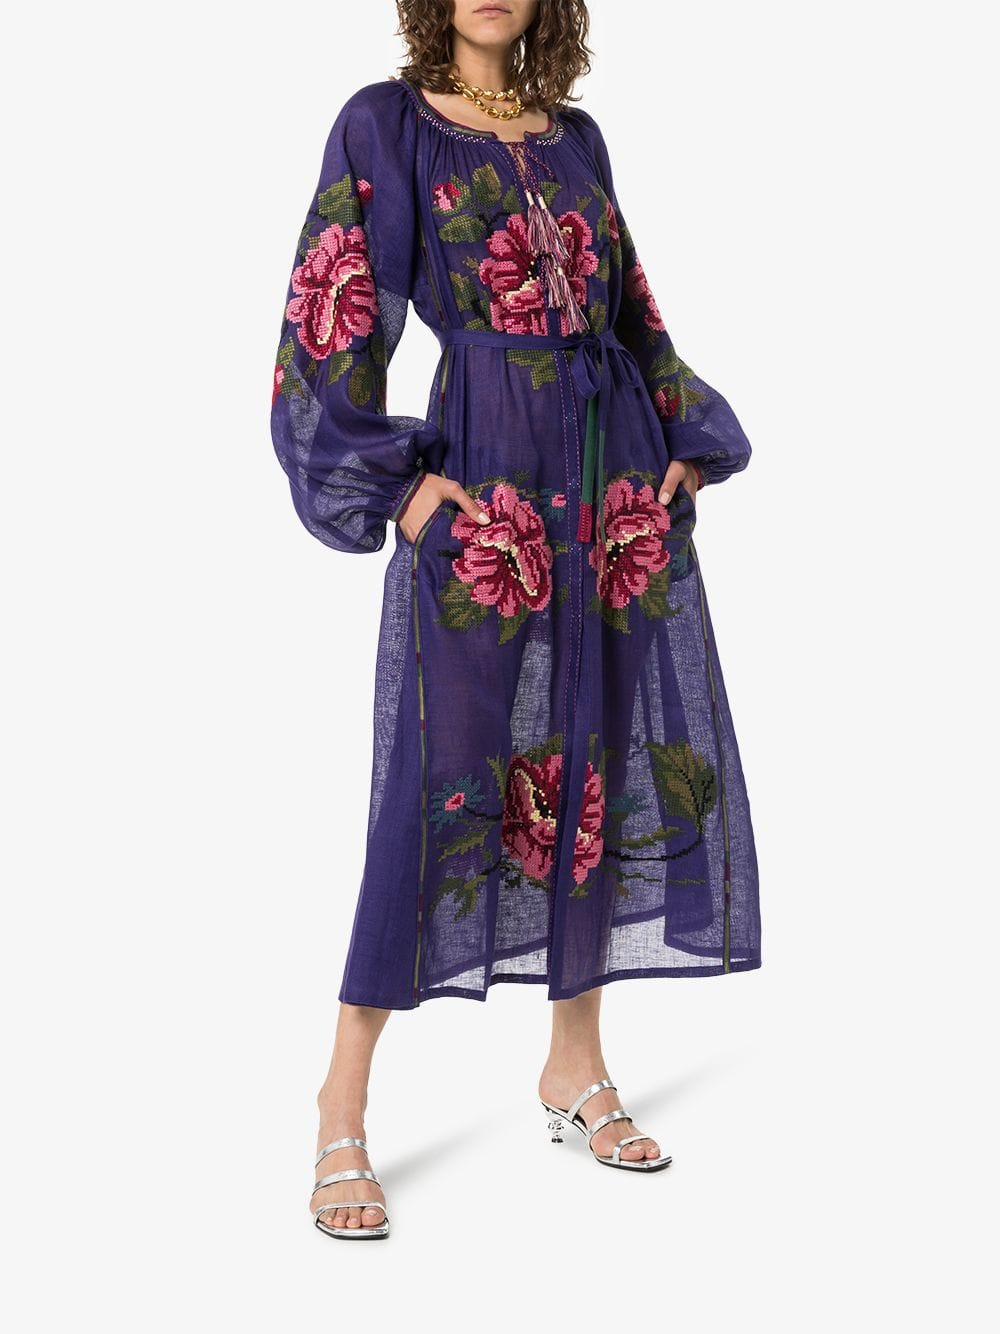 VITA KIN Gypsy Queen Linen Midi Navy Dress